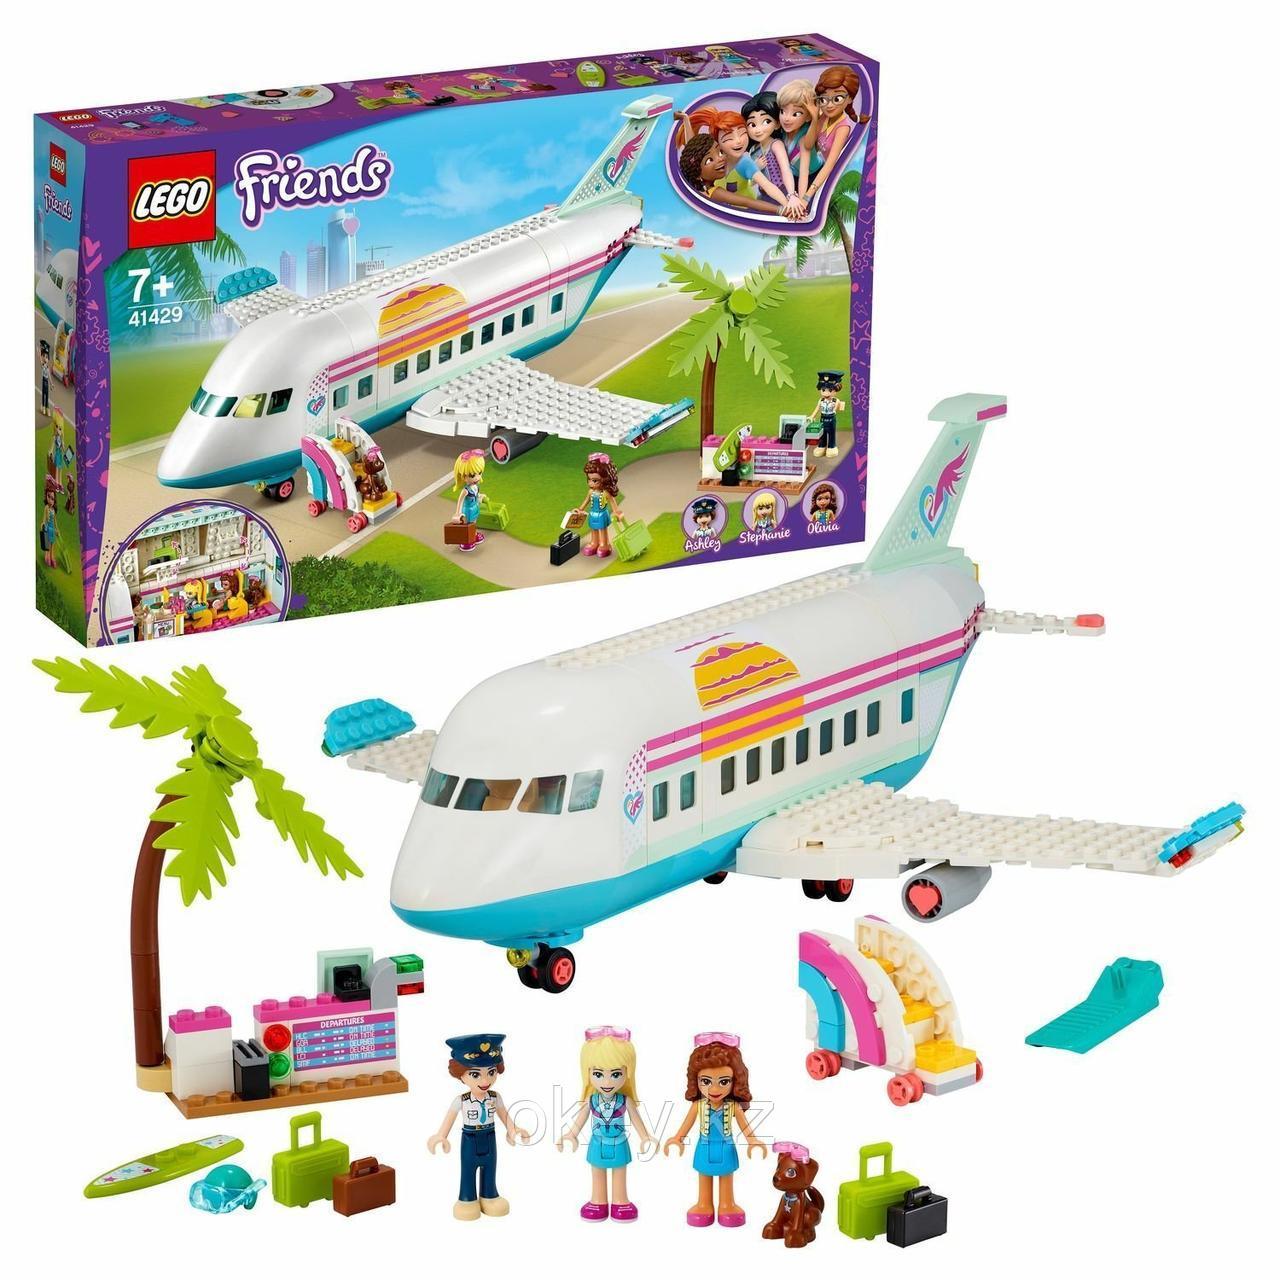 LEGO Friends: Самолёт в Хартлейк Сити 41429 - фото 2